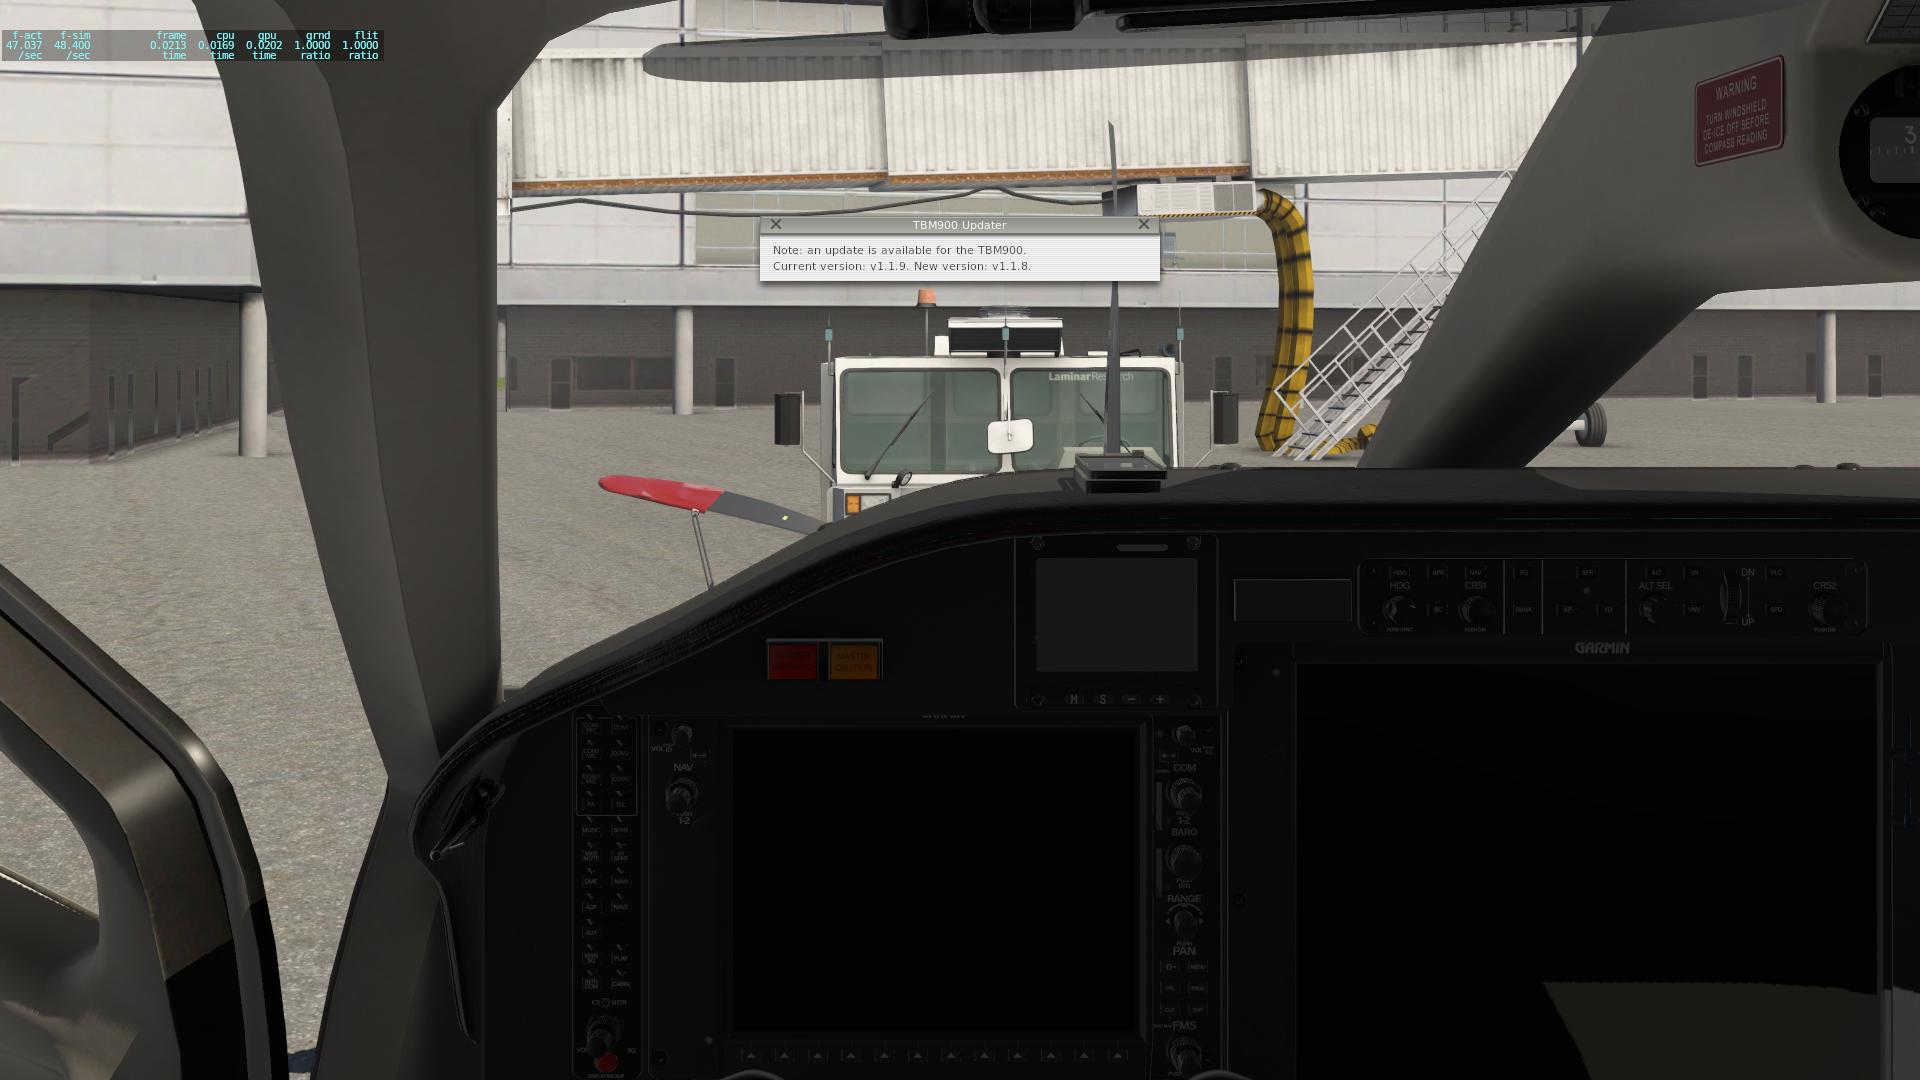 TBM 900 v1 1 9 Update Released! - TBM 900 - X-Pilot